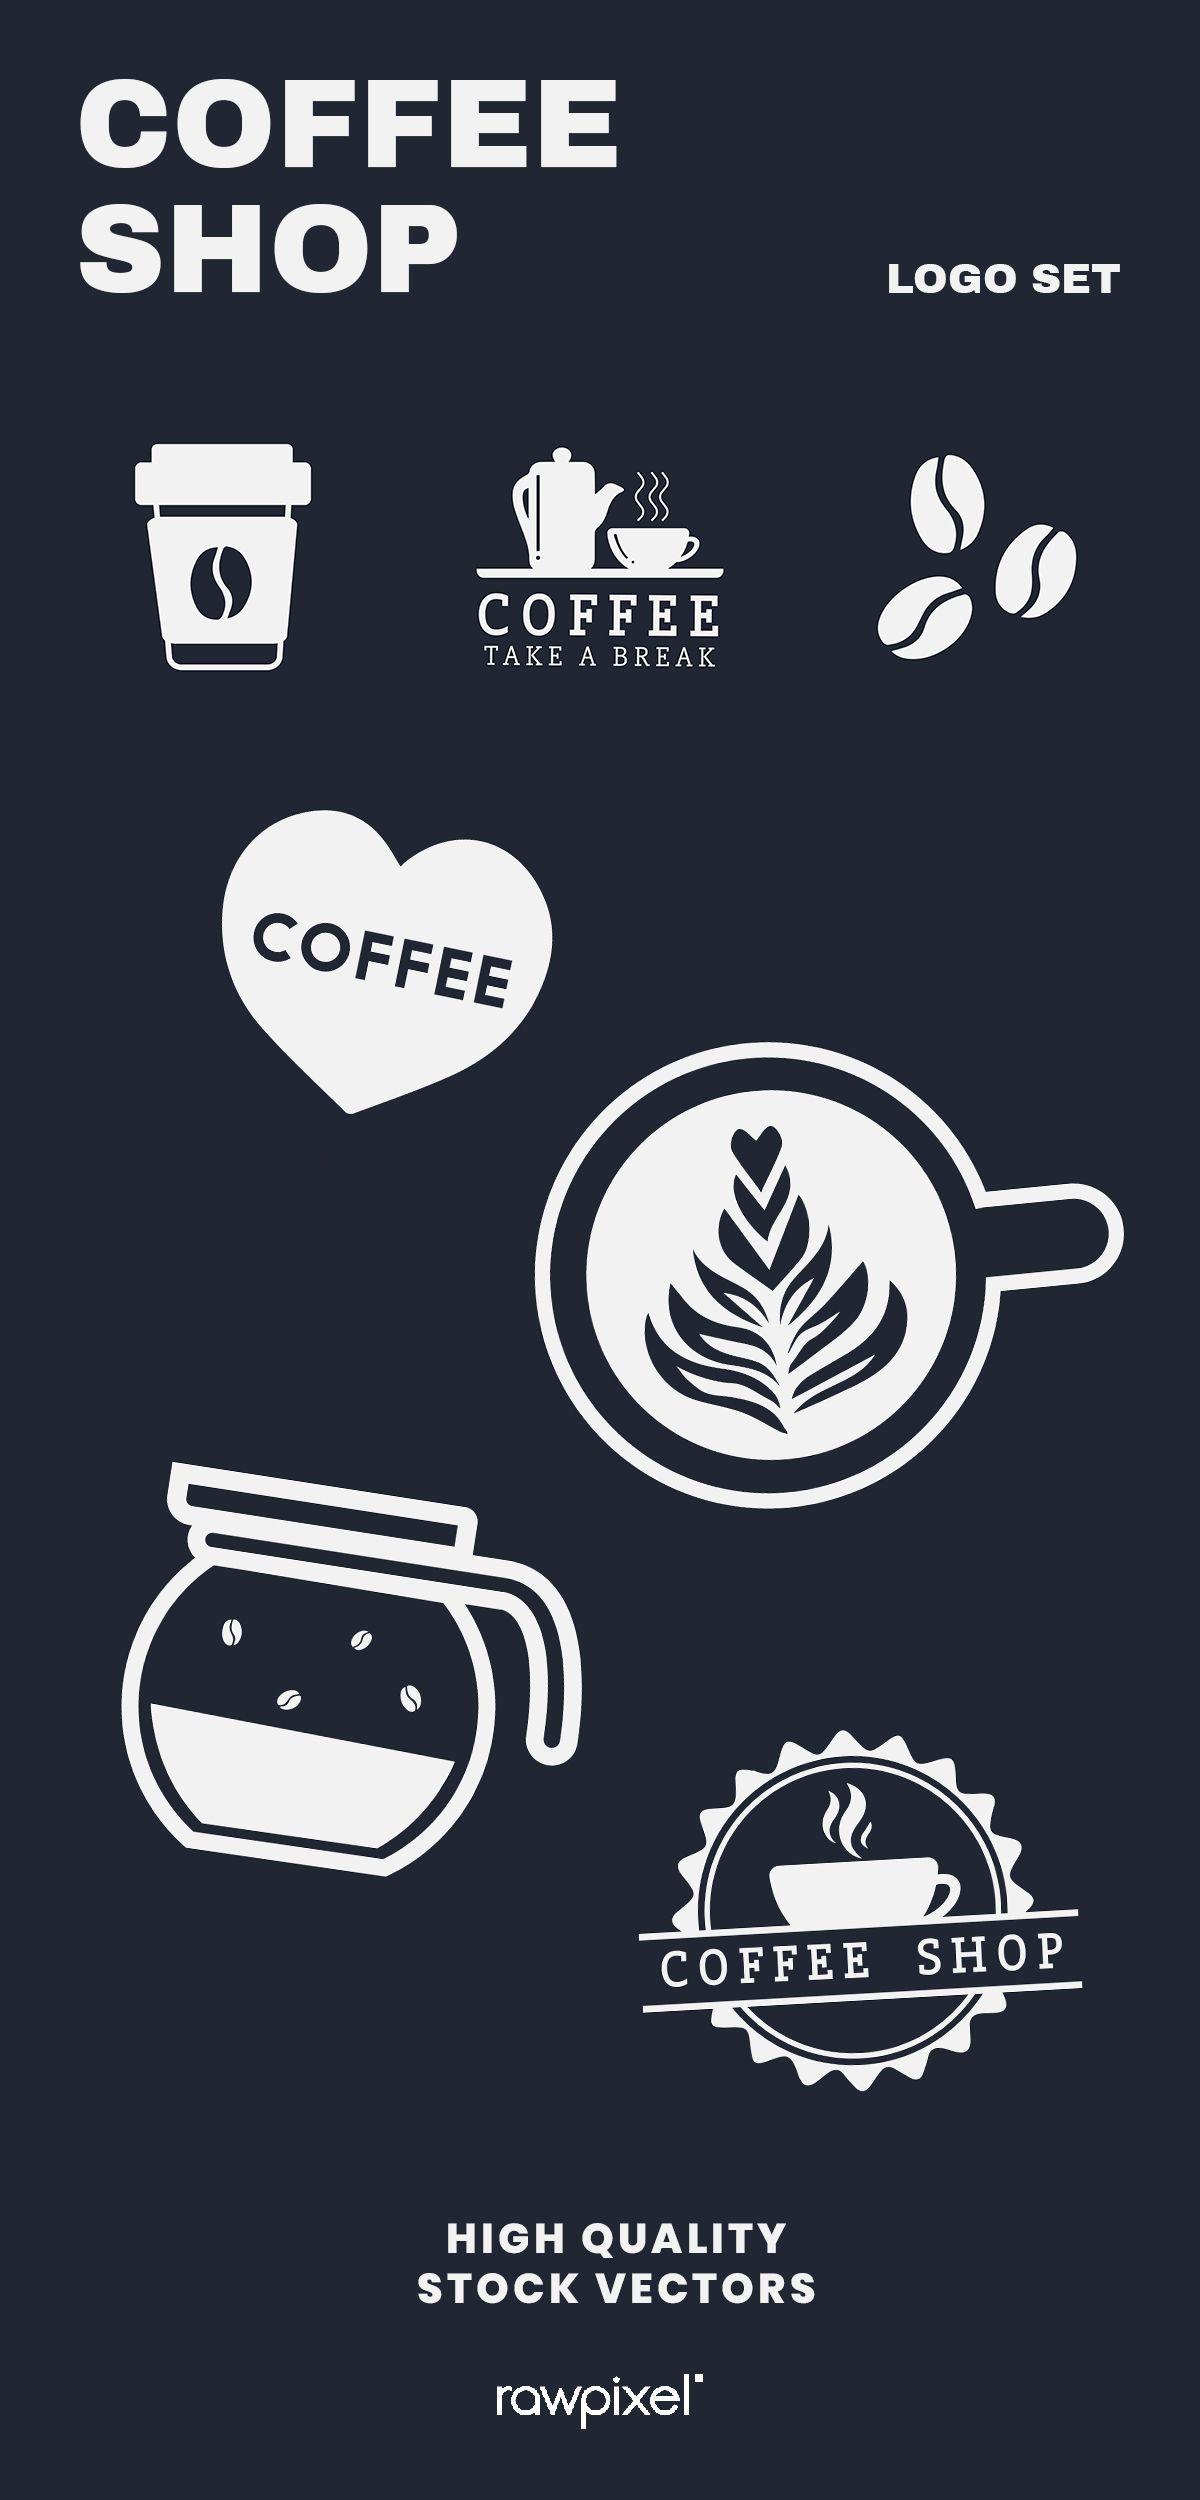 Download these amazing royaltyfree coffee shop branding